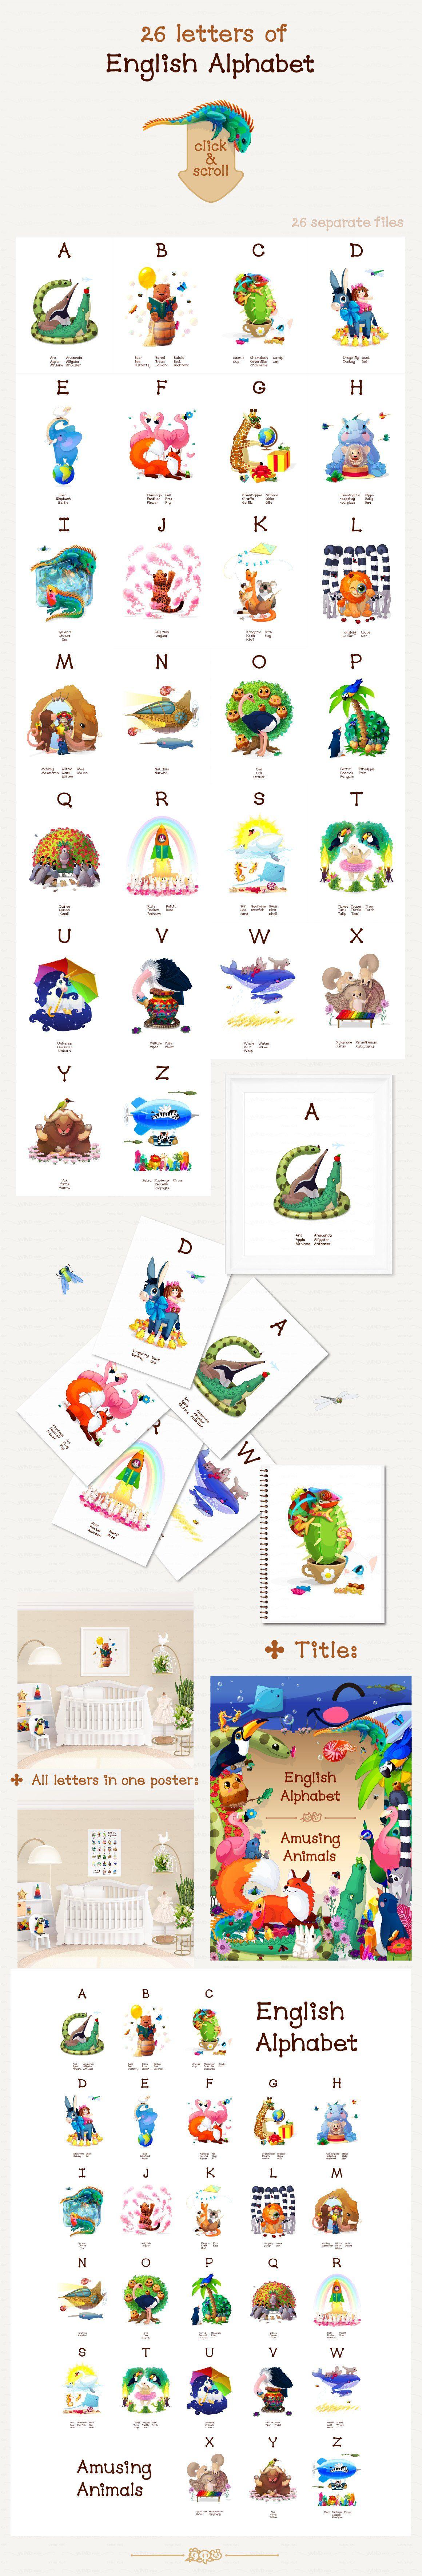 ♥ vector English ABC. Animals | Animal alphabet, English abc, Learn english